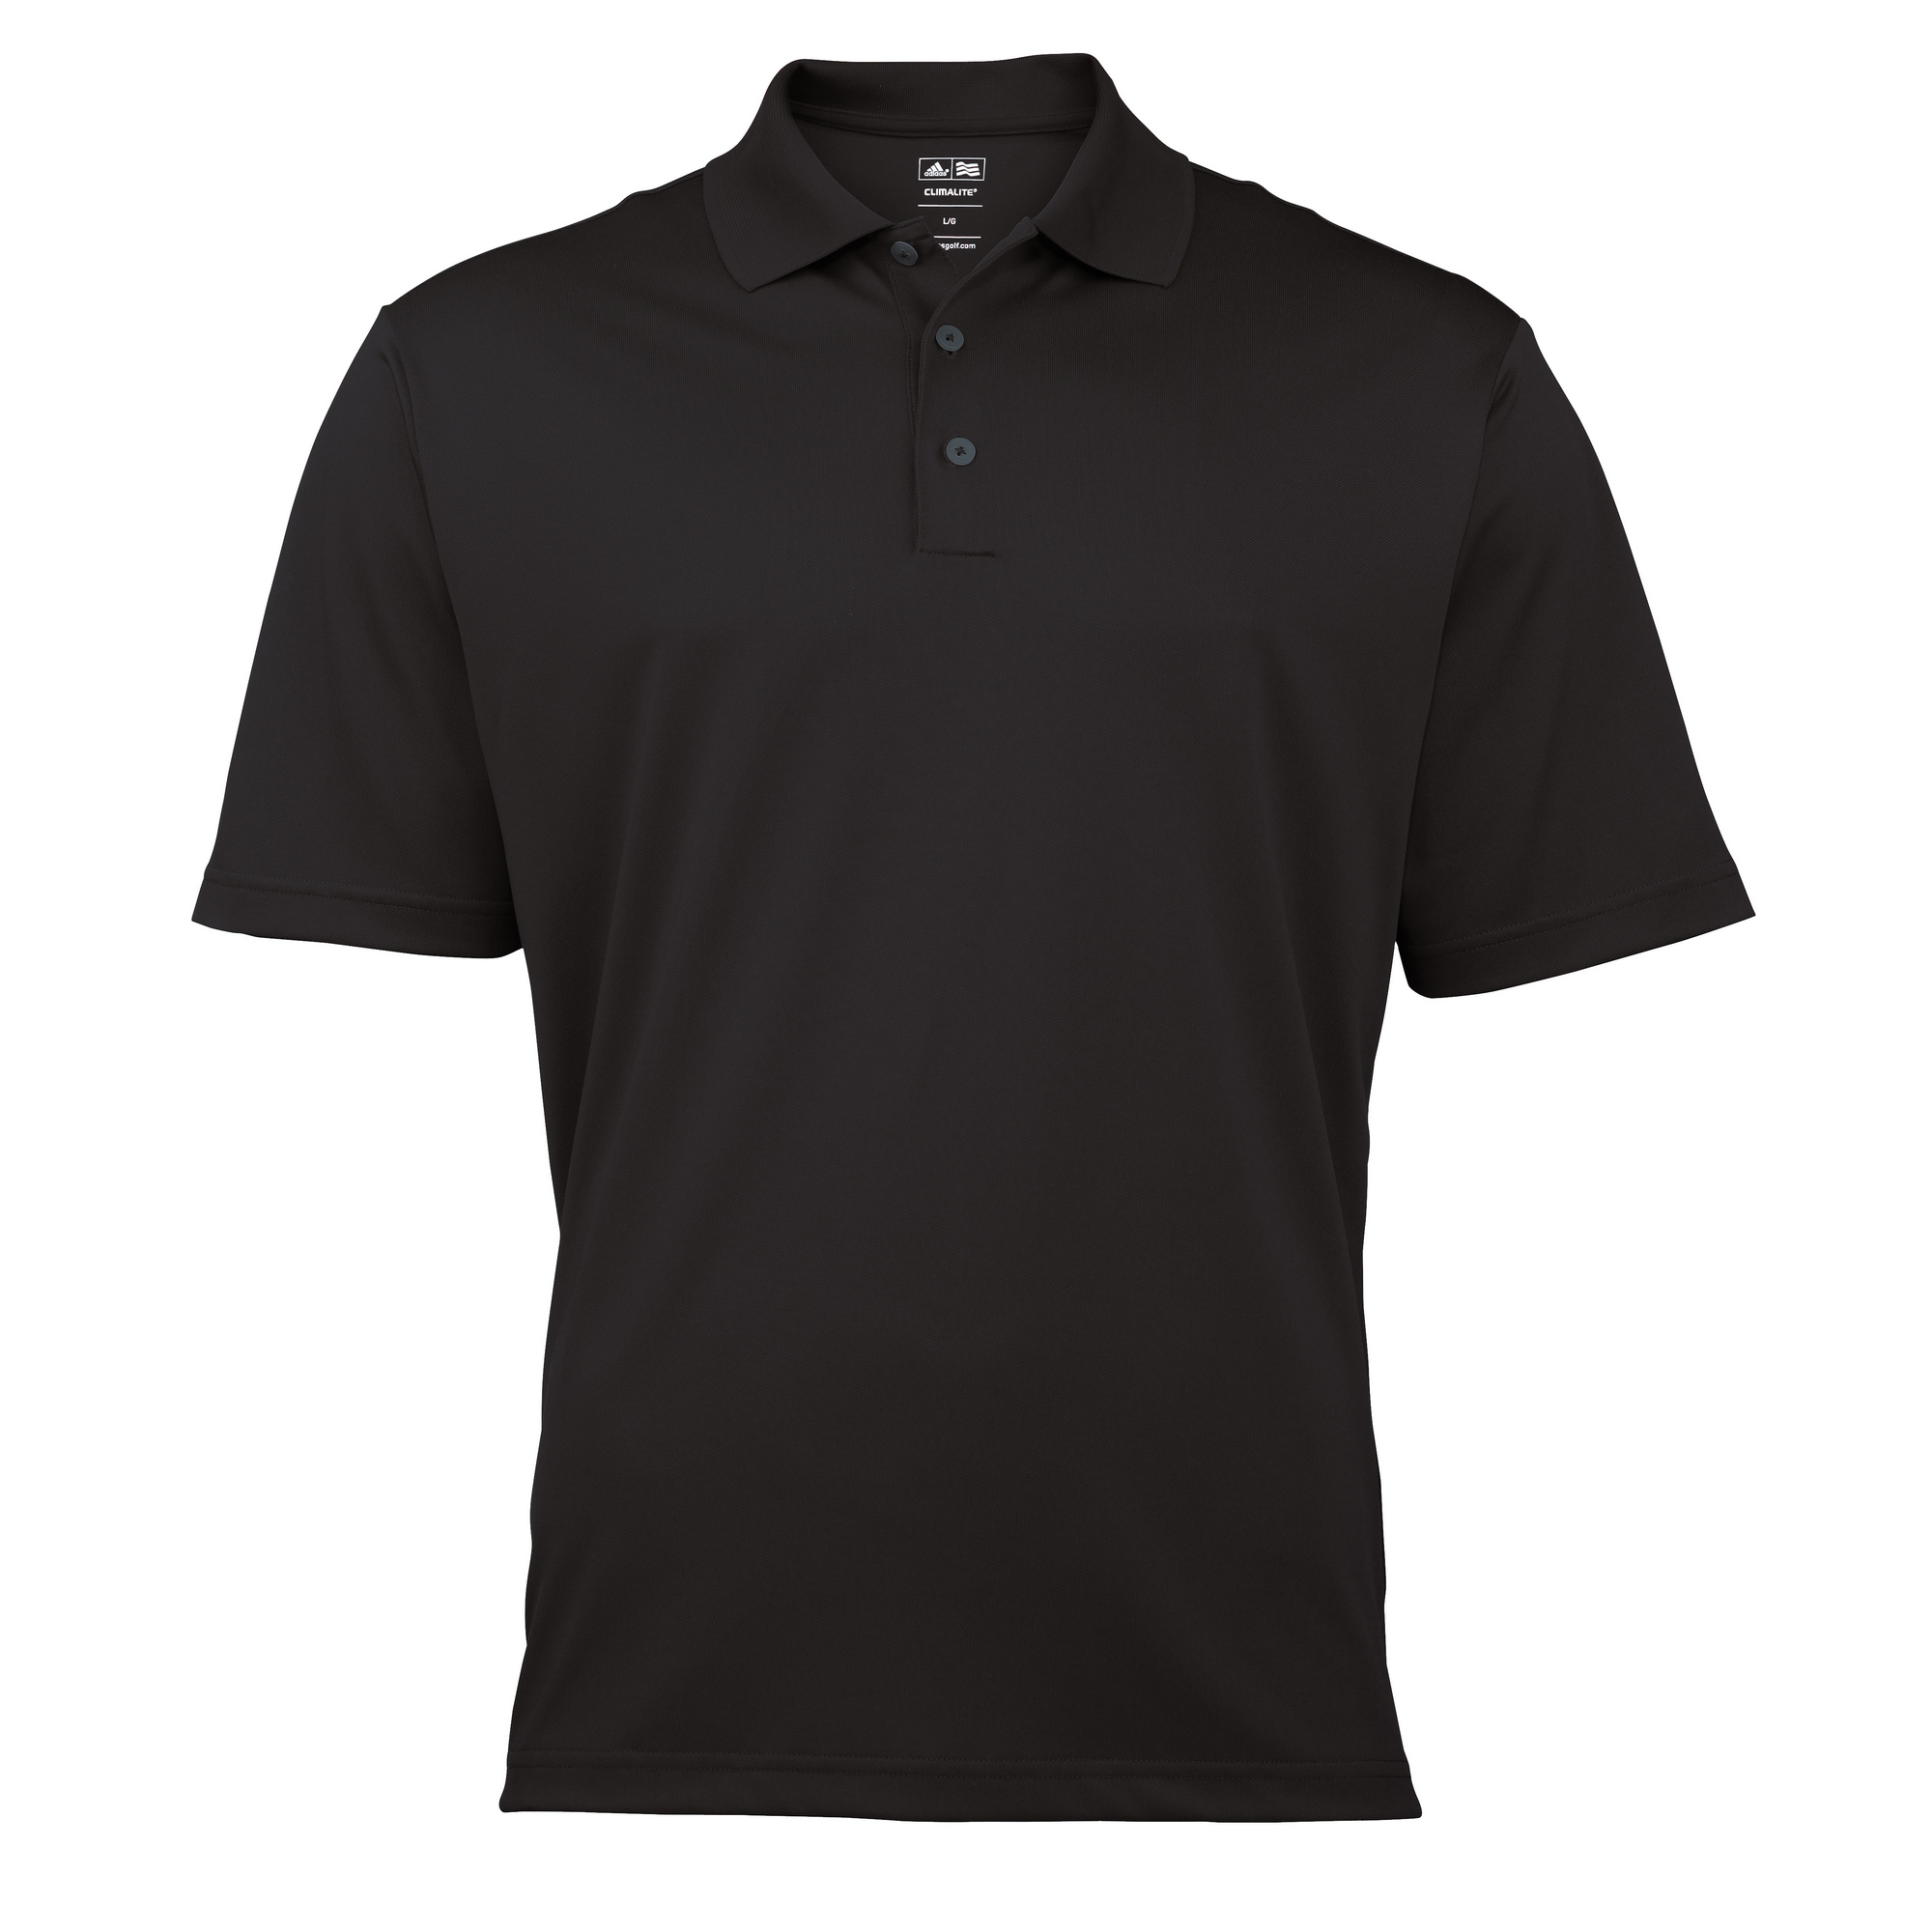 Adidas golf climalite mens pique plain fashion sports polo for Best mens sport shirts